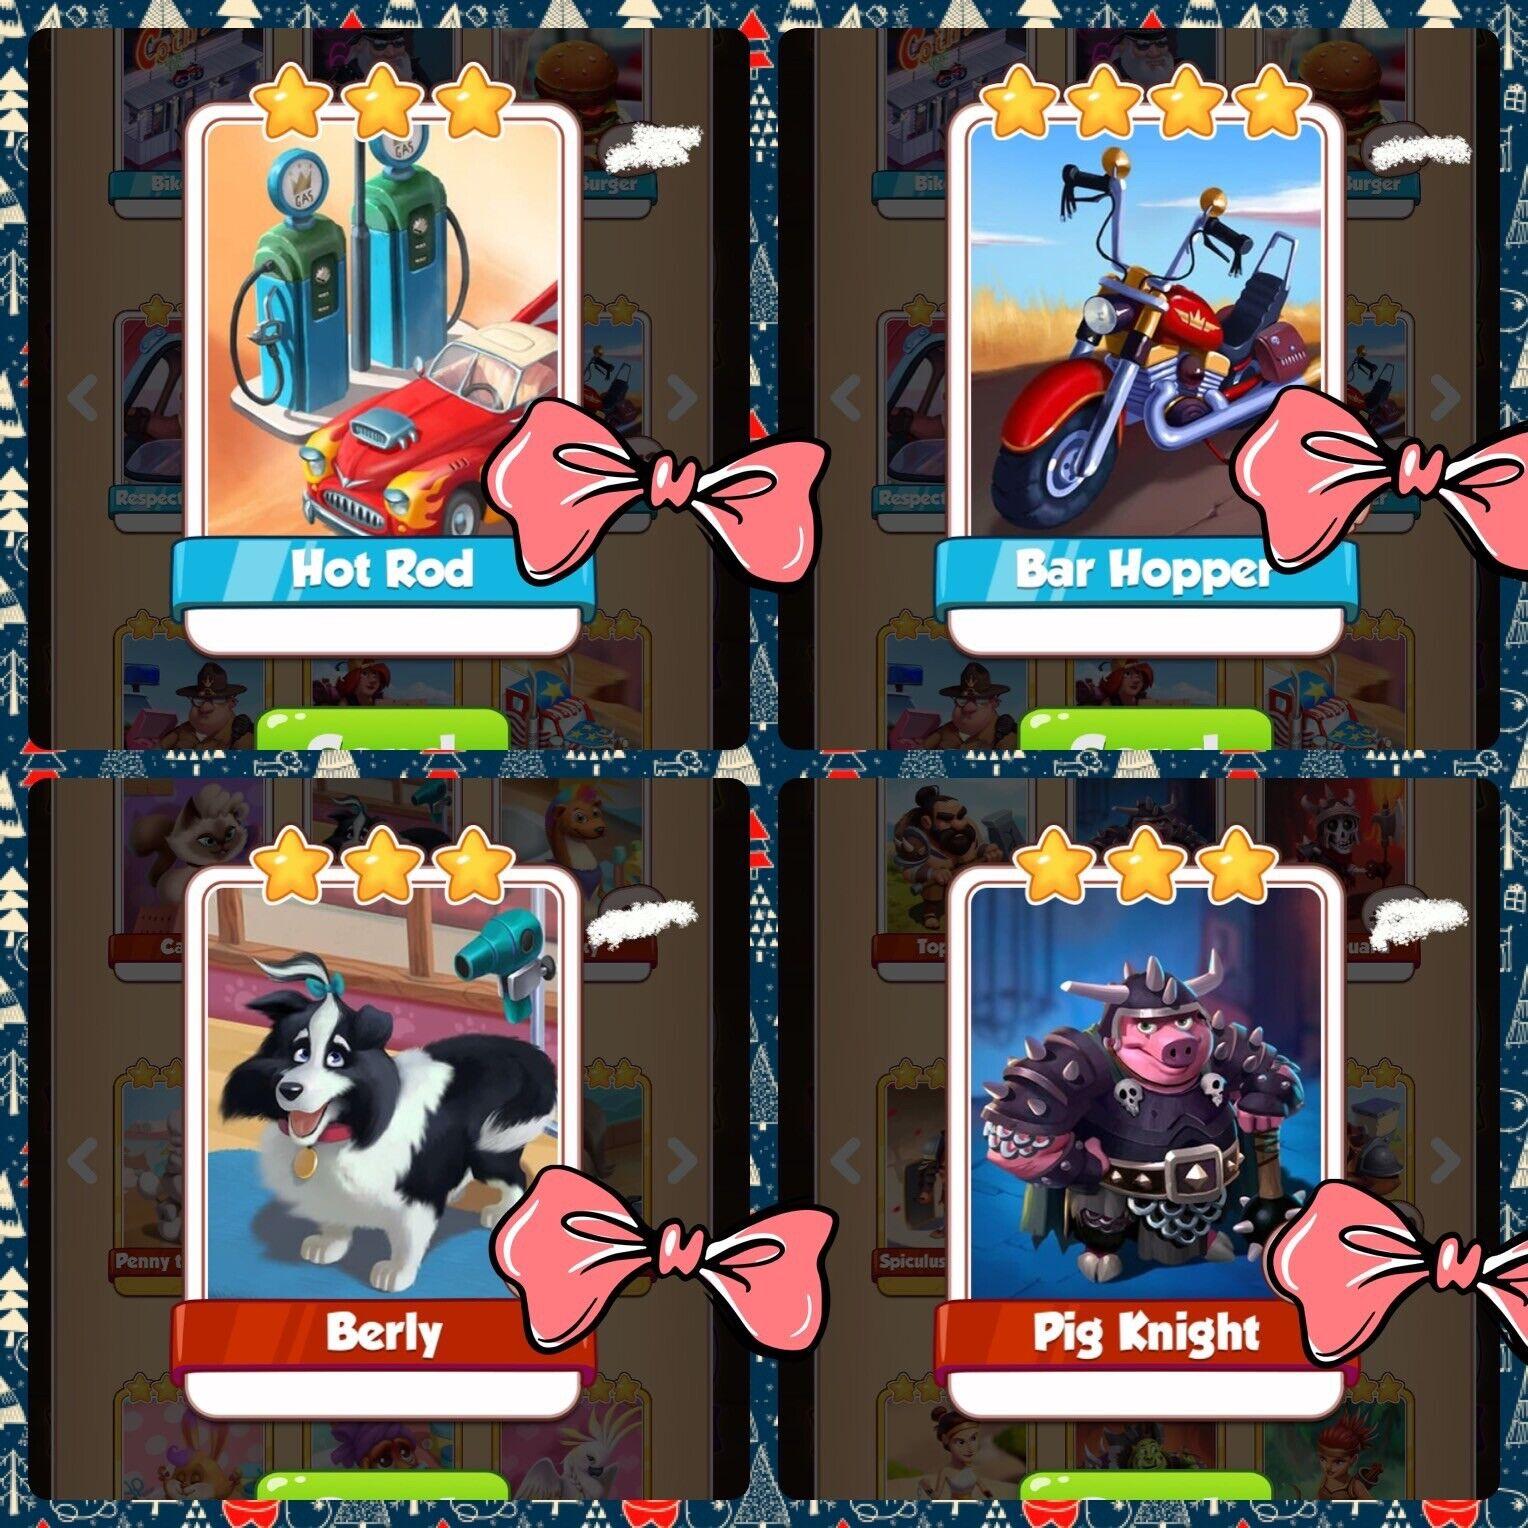 Coin Master Any 20 Card, Berly X5 Hot Rod X5 Bar Hopper X5 Pig Knight Fast Send